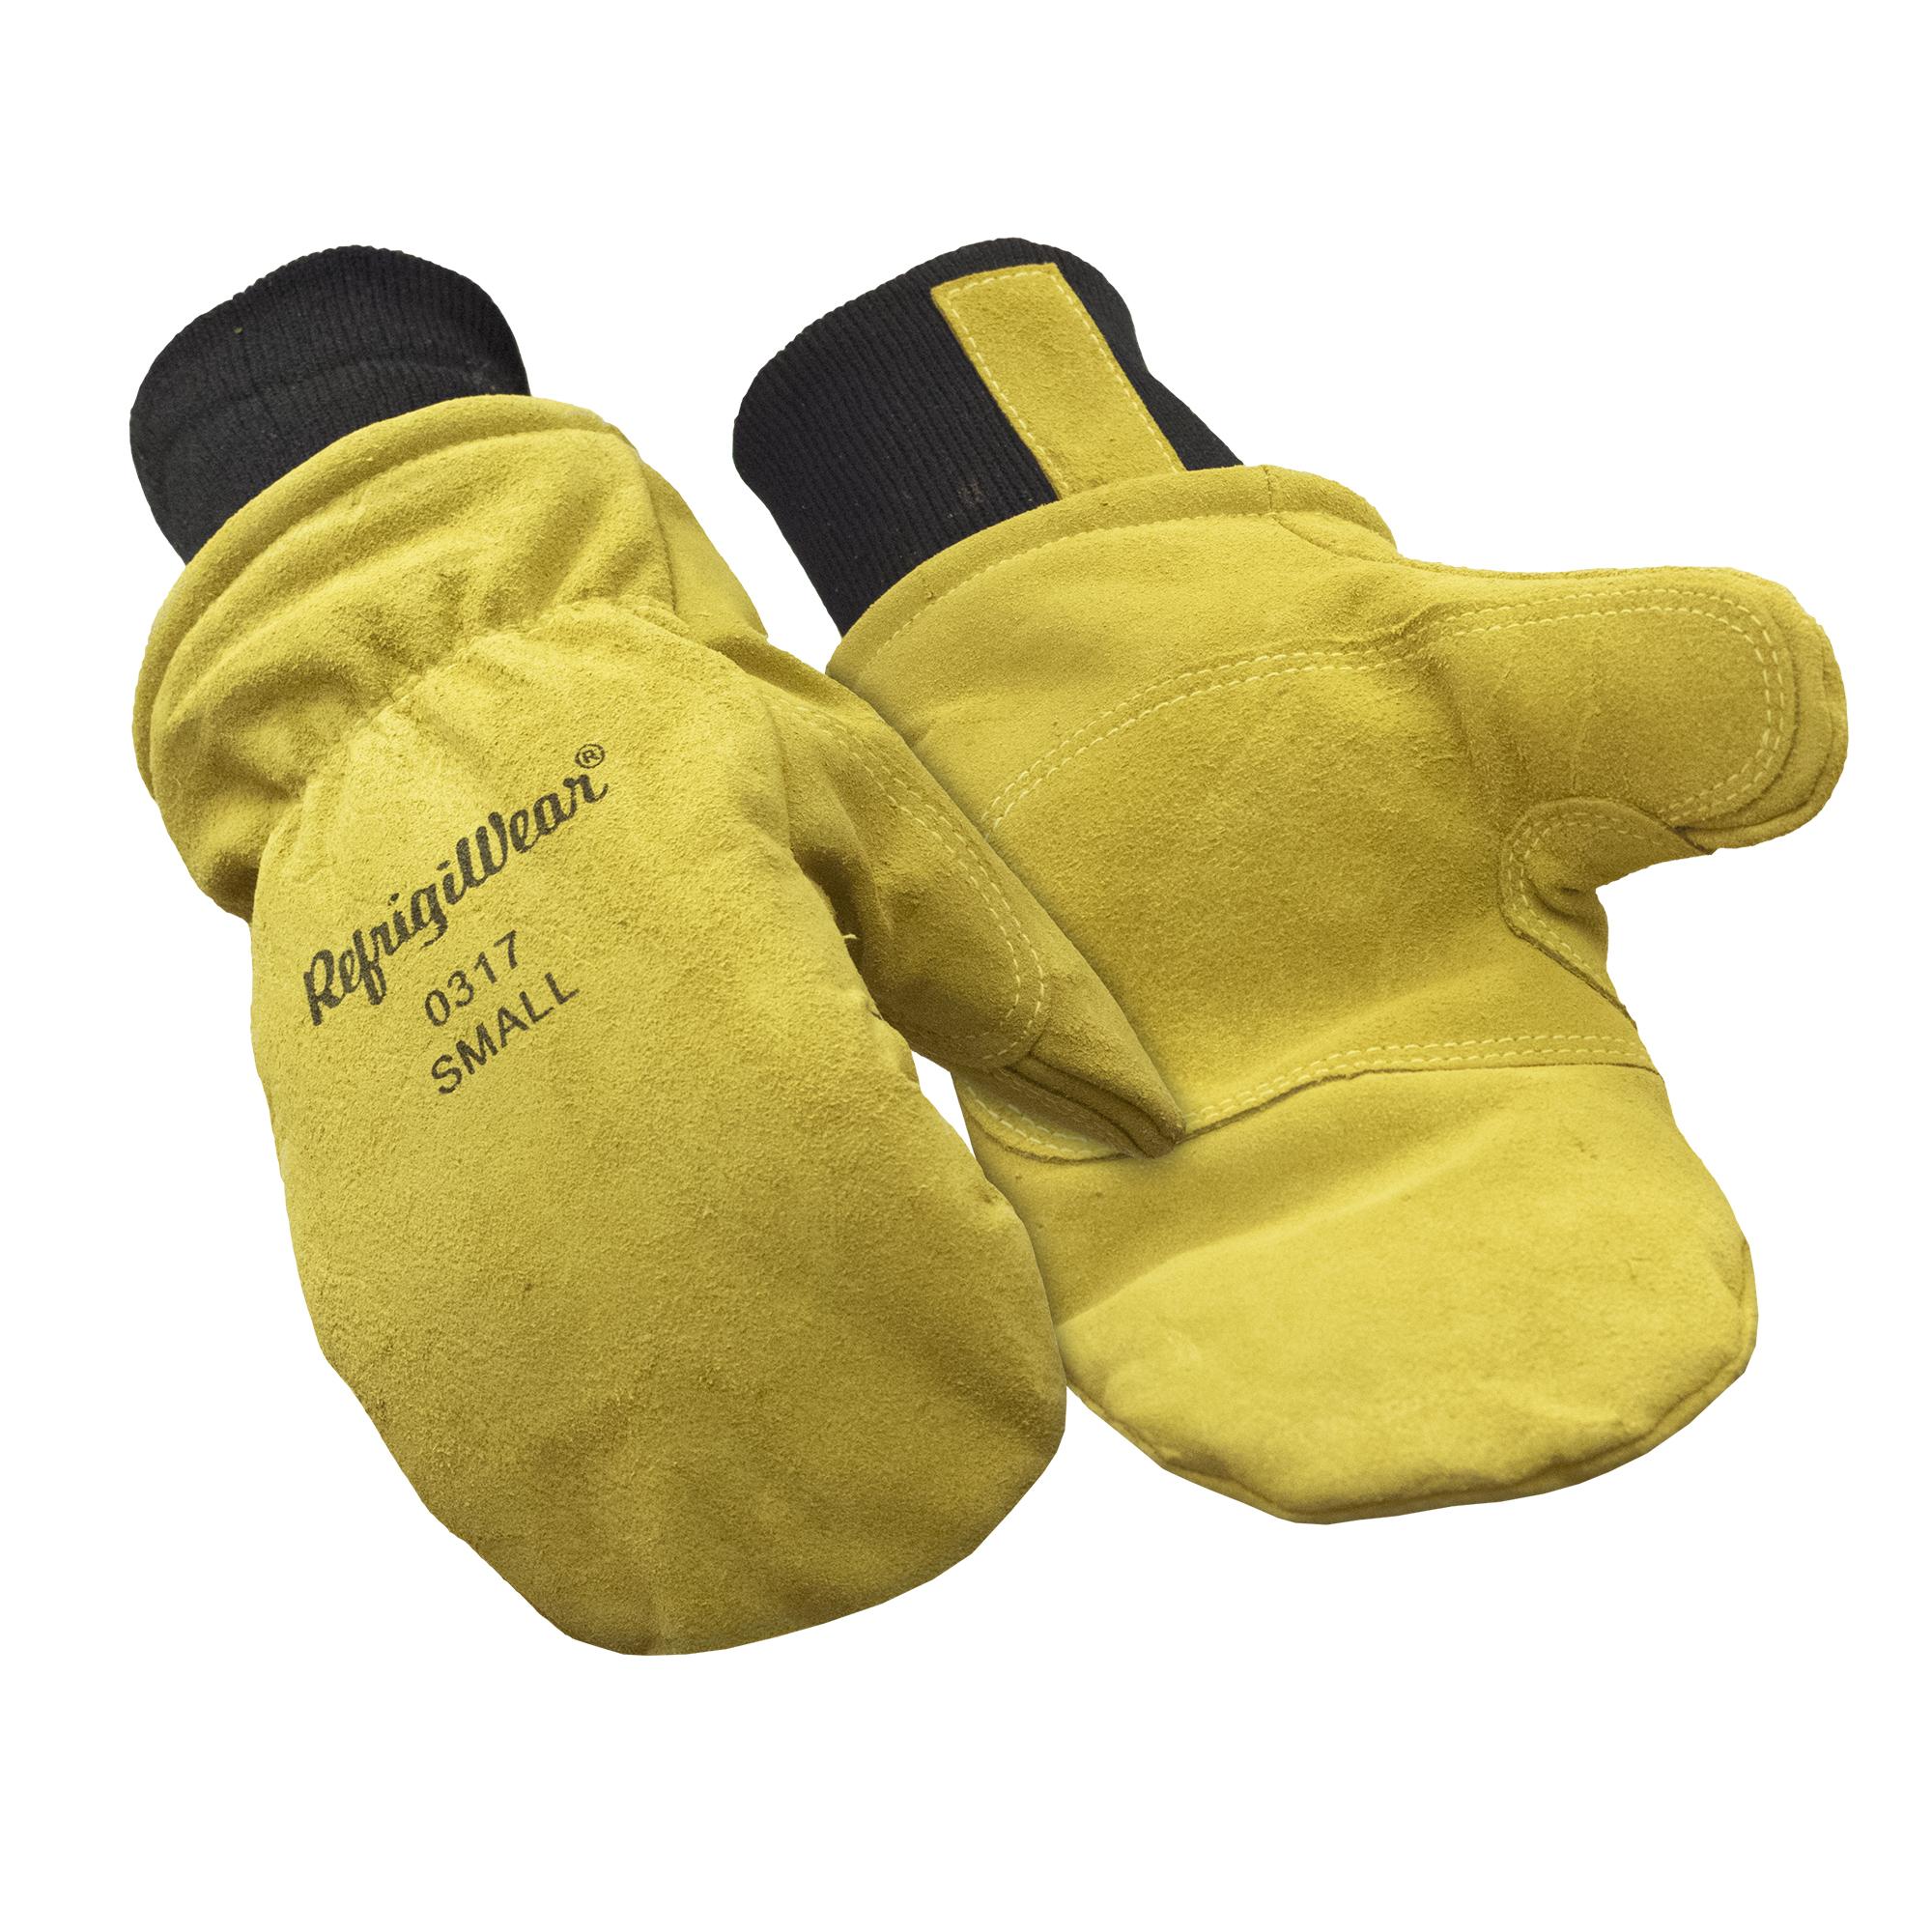 RefrigiWear Warm Fiberfill Insulated Tricot Lined Goatskin Leather Work Gloves